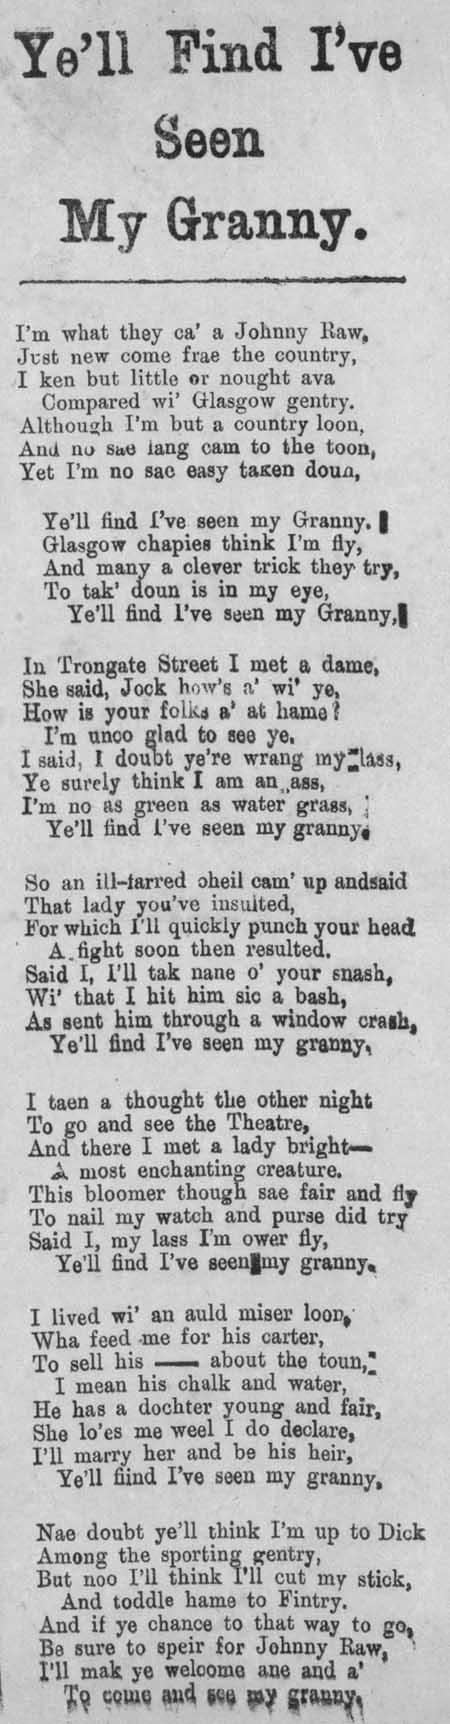 Broadside ballad entitled 'Ye'll Find I've Seen My Granny'